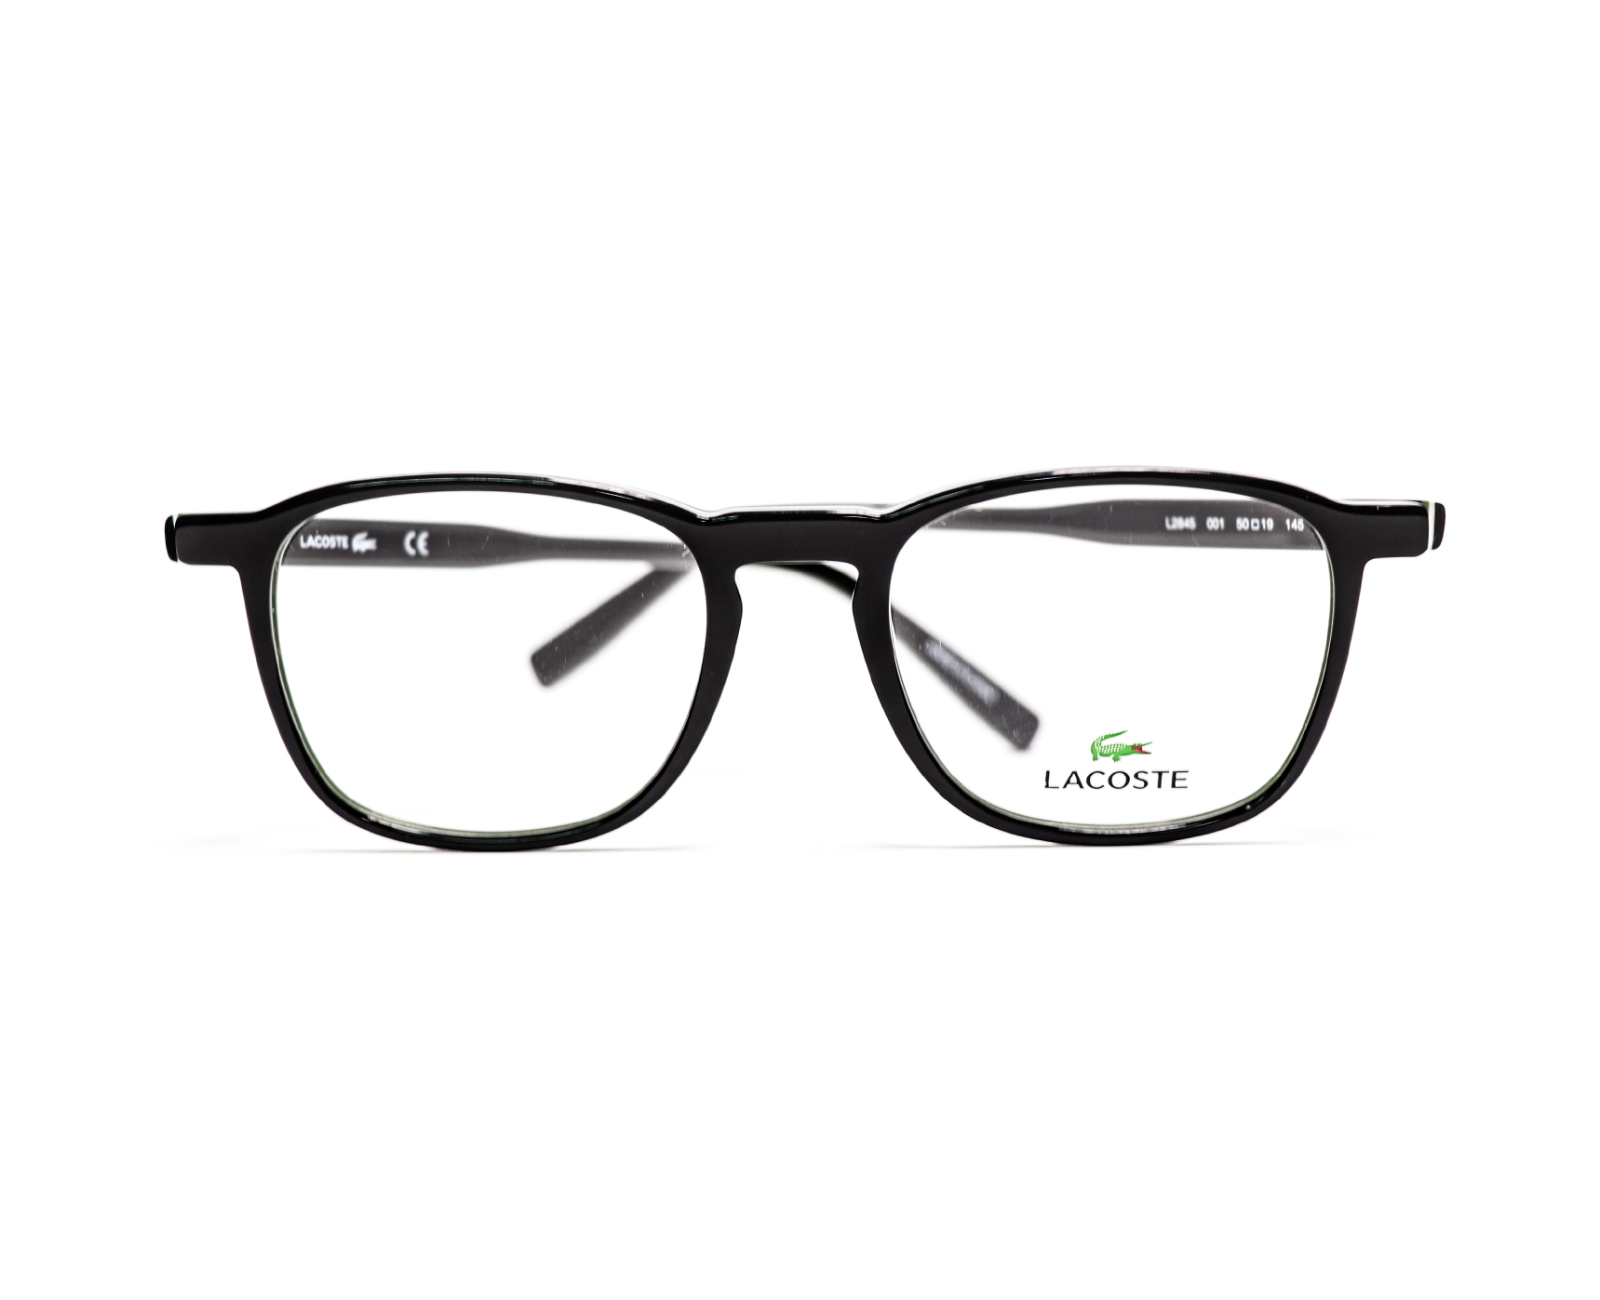 Lacoste L2845 in Black White Green